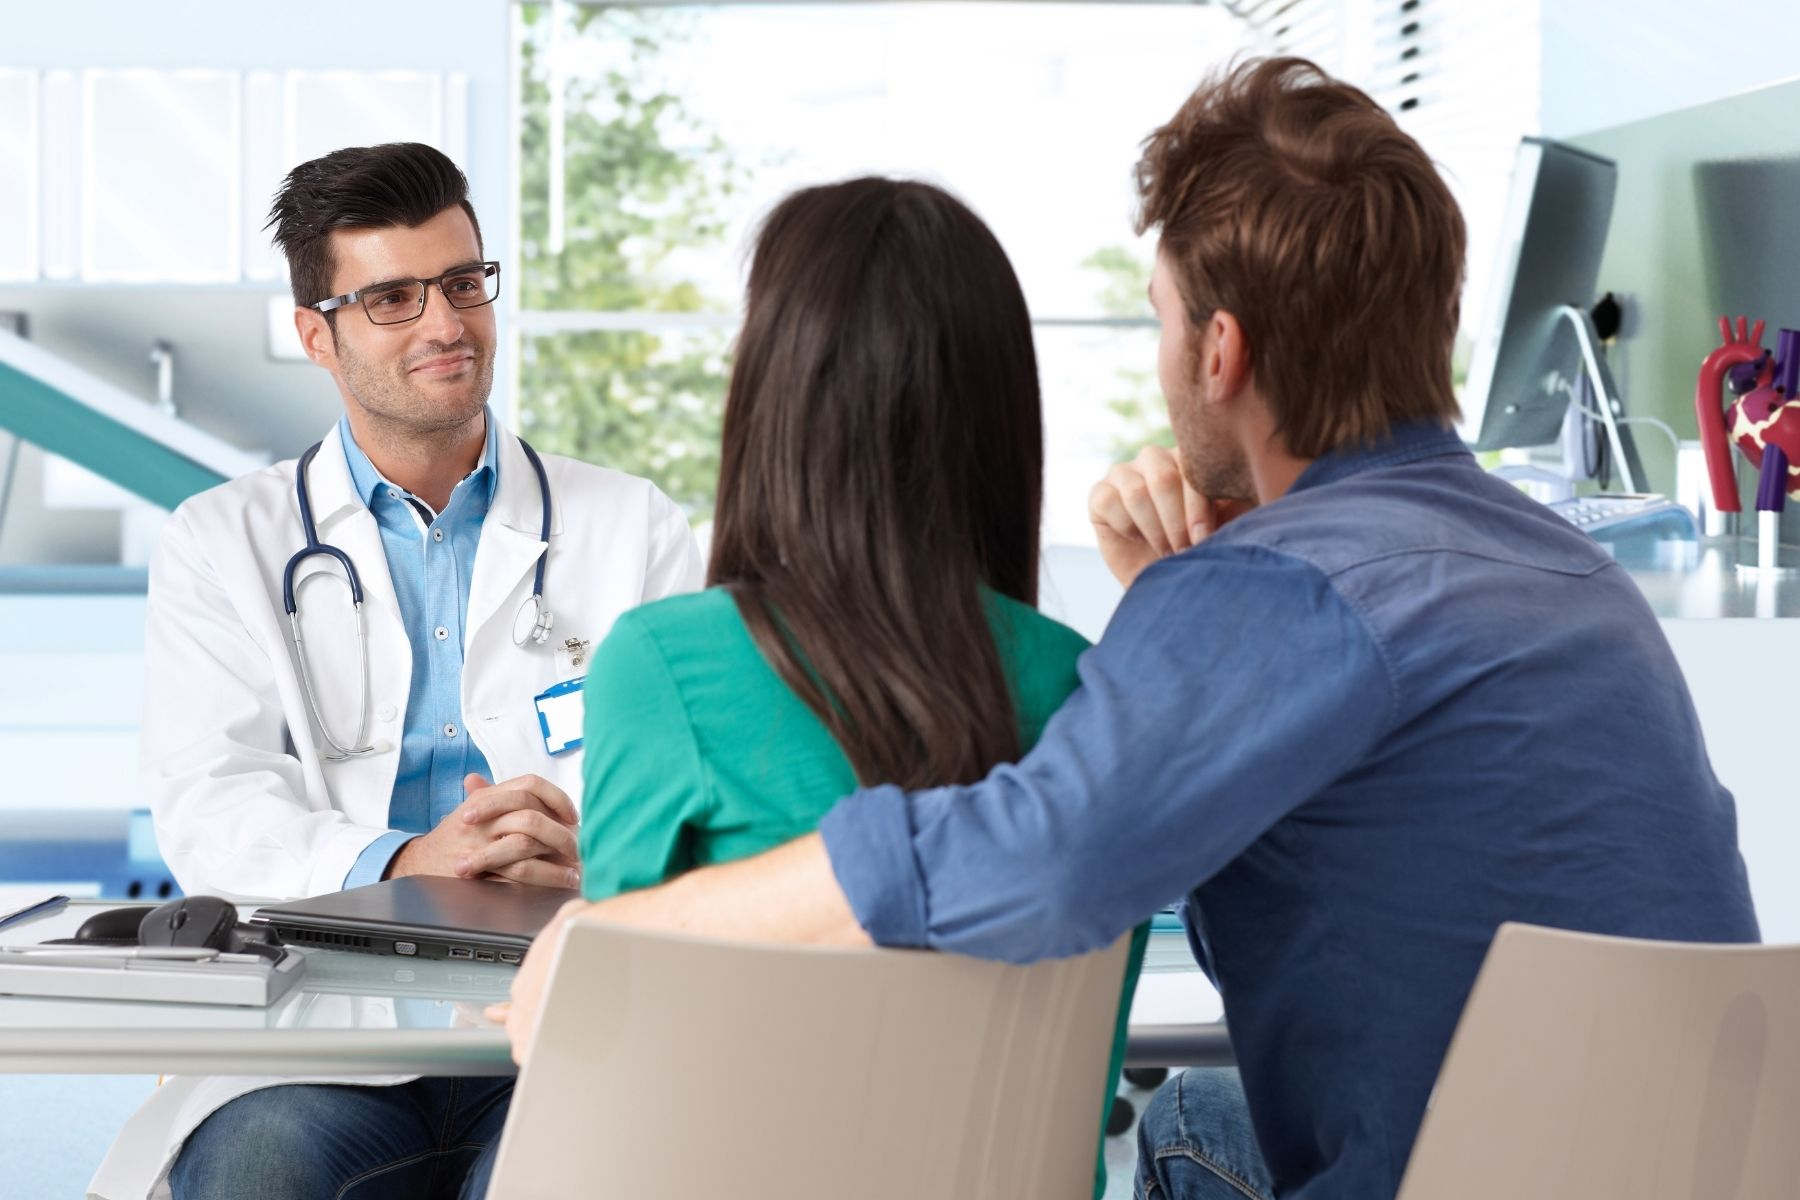 konsultasi-program-hamil-pada-klinik-kehamilan-sehat